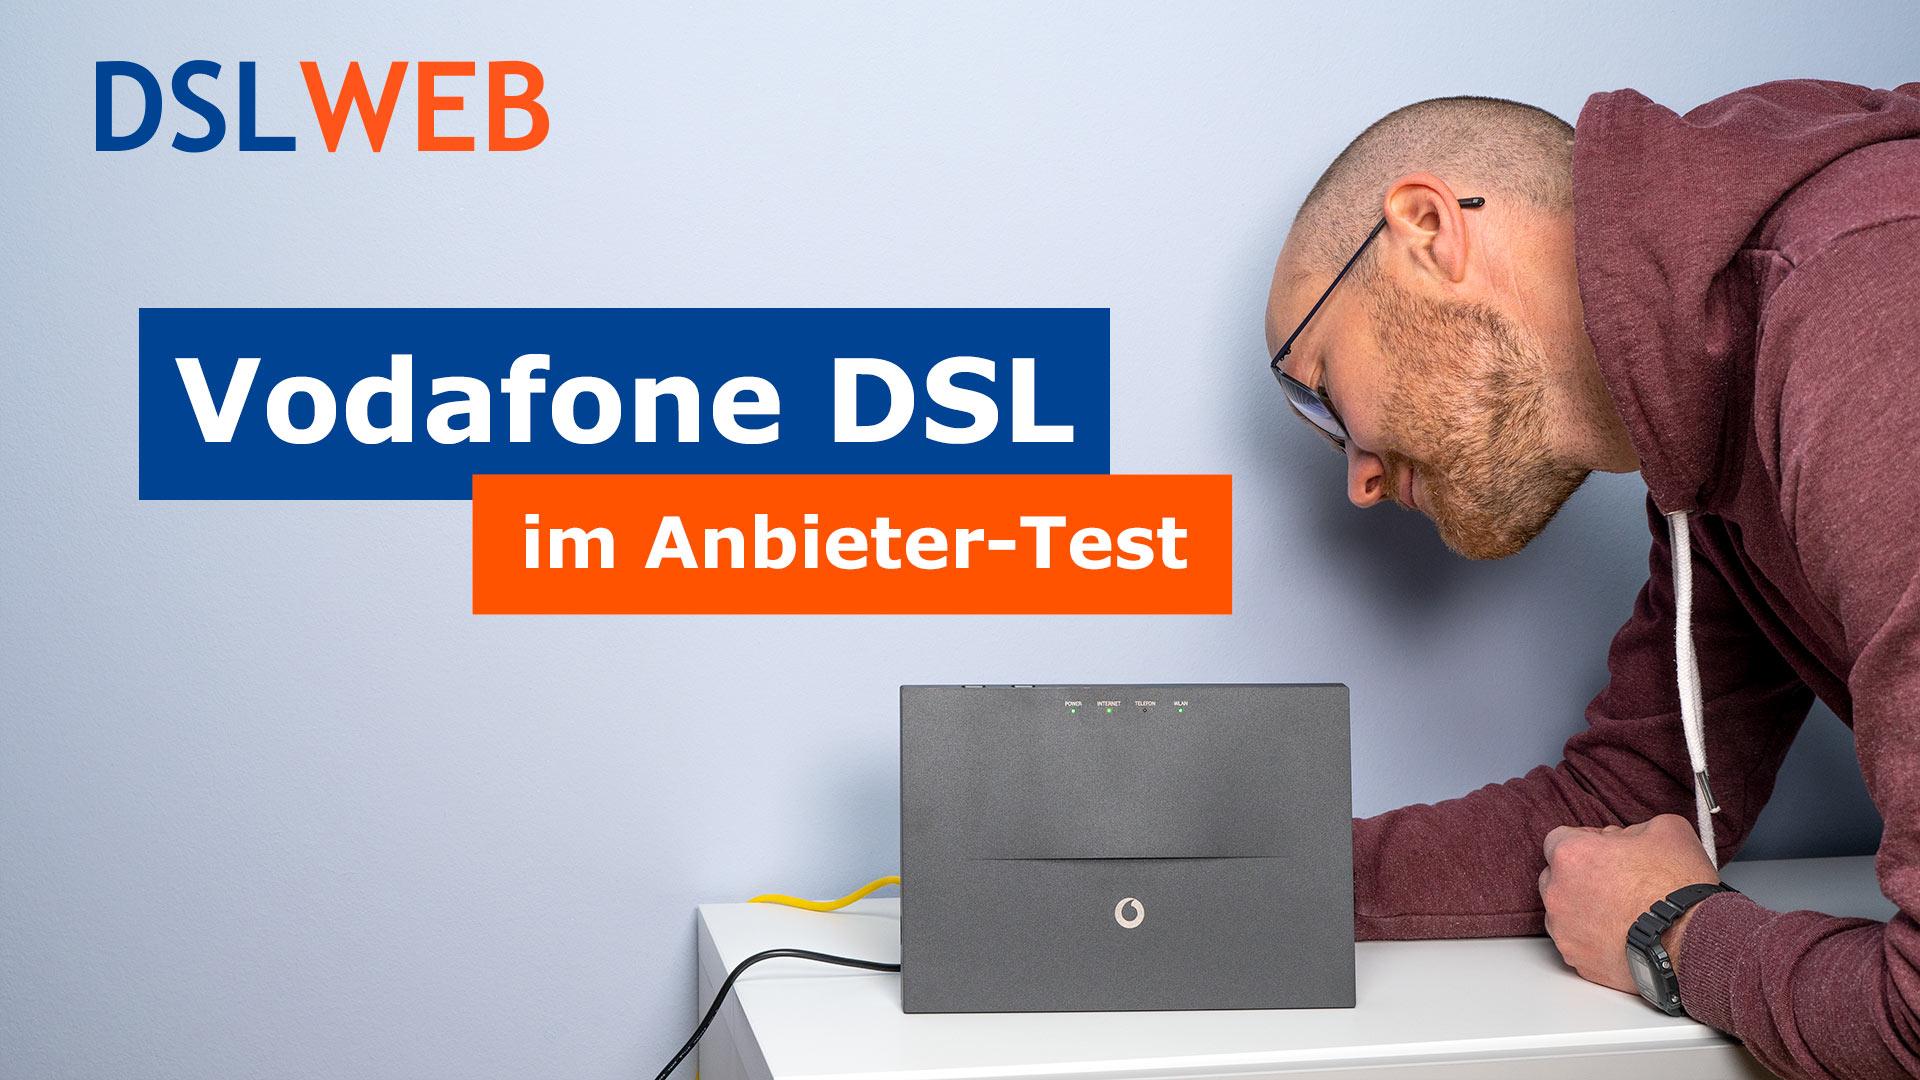 Vodafone DSL im Anbieter-Test